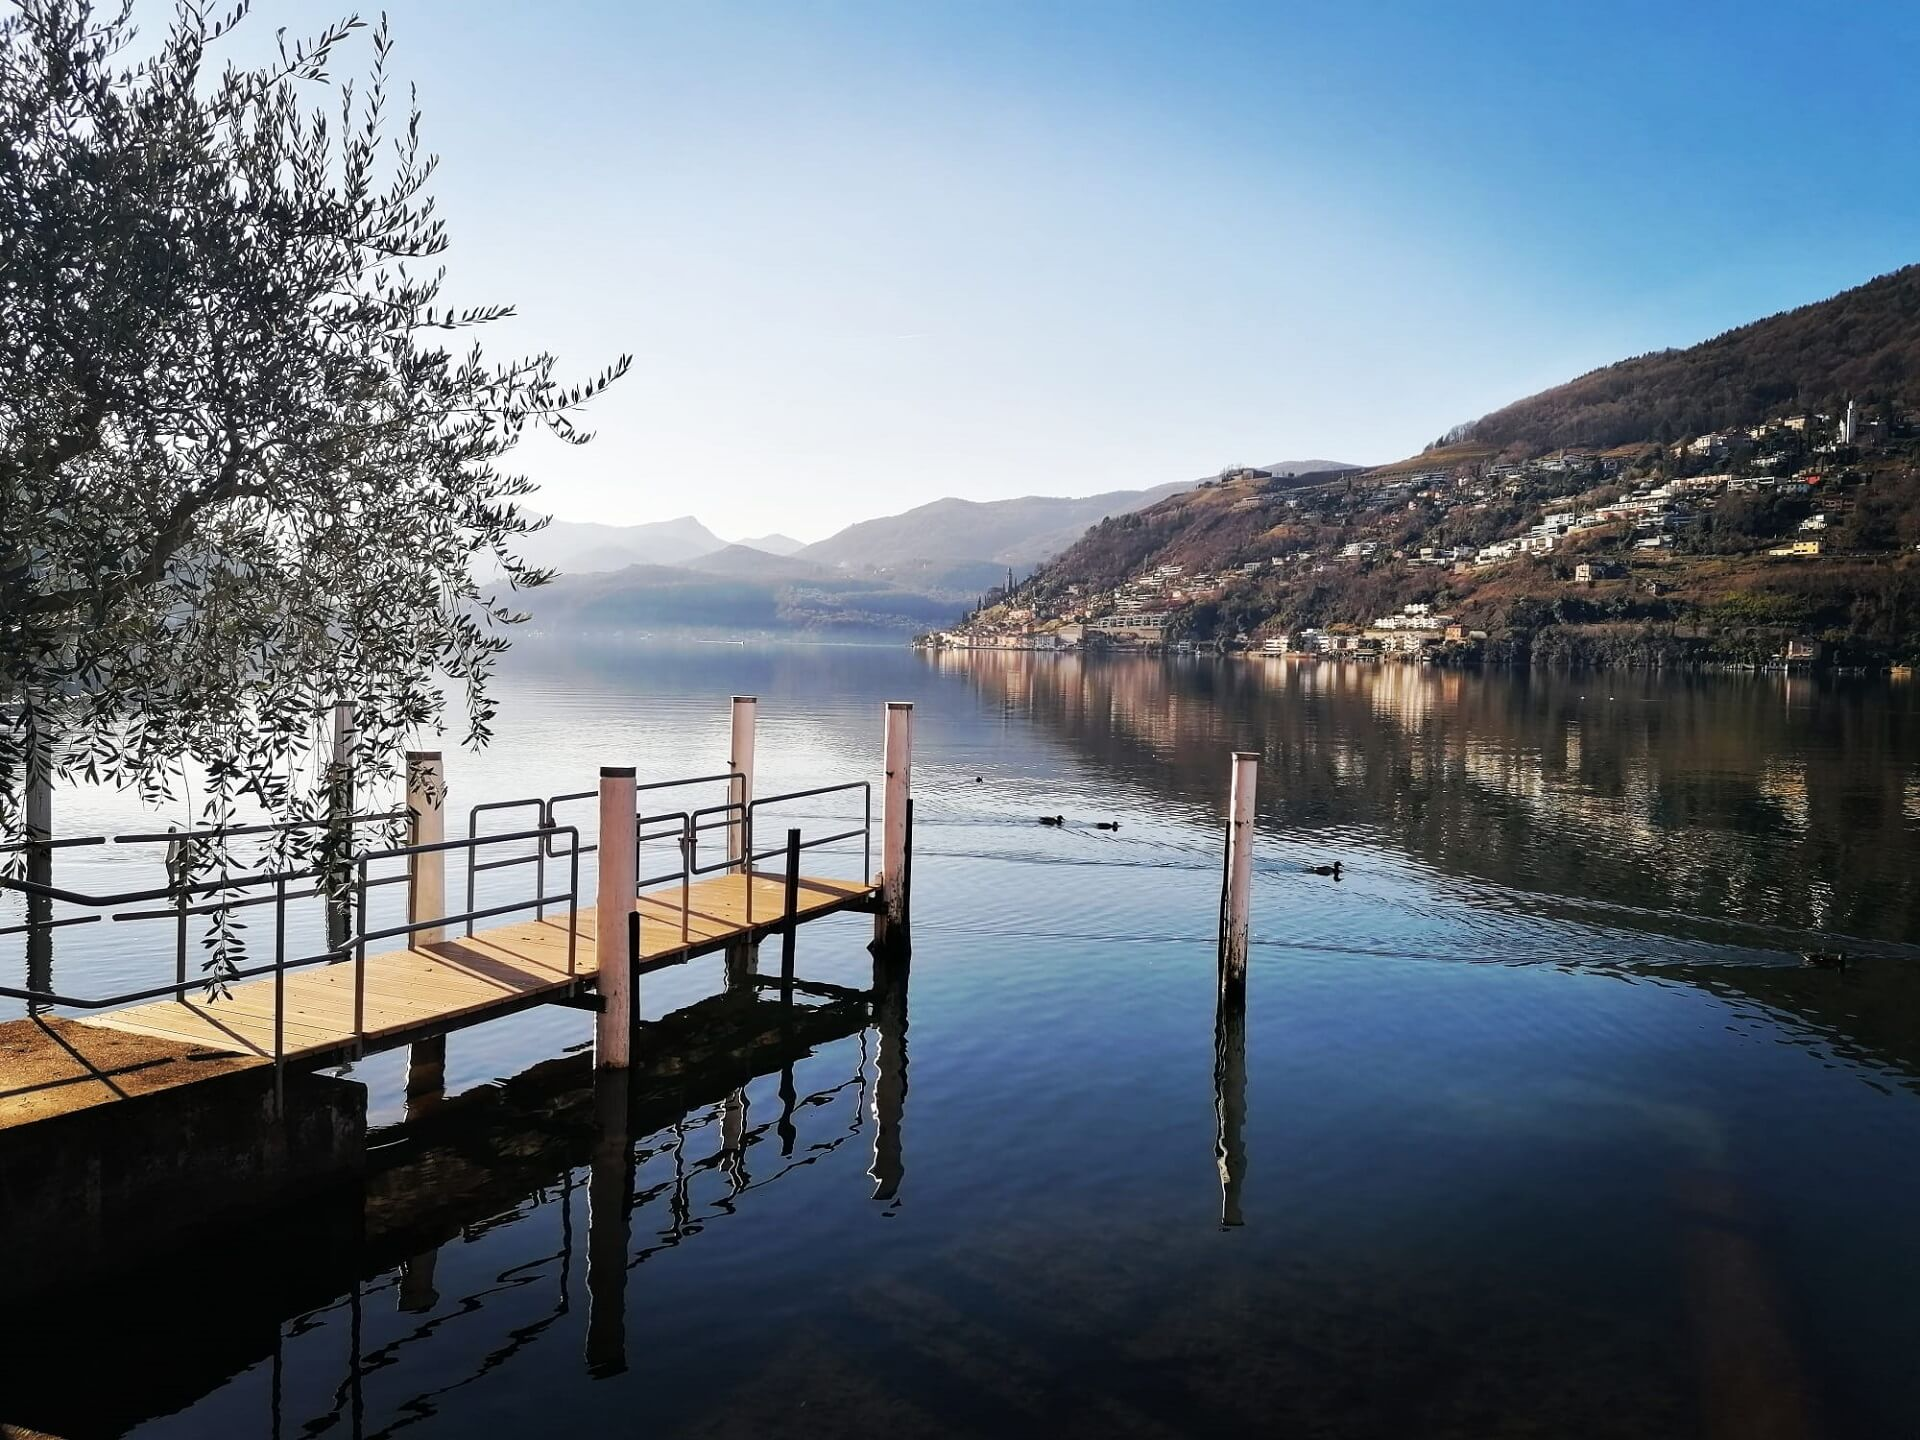 Dolceresio Lugano Lake B&B, Brusino Arsizio - Galerie - 1 12 gennaio 2020